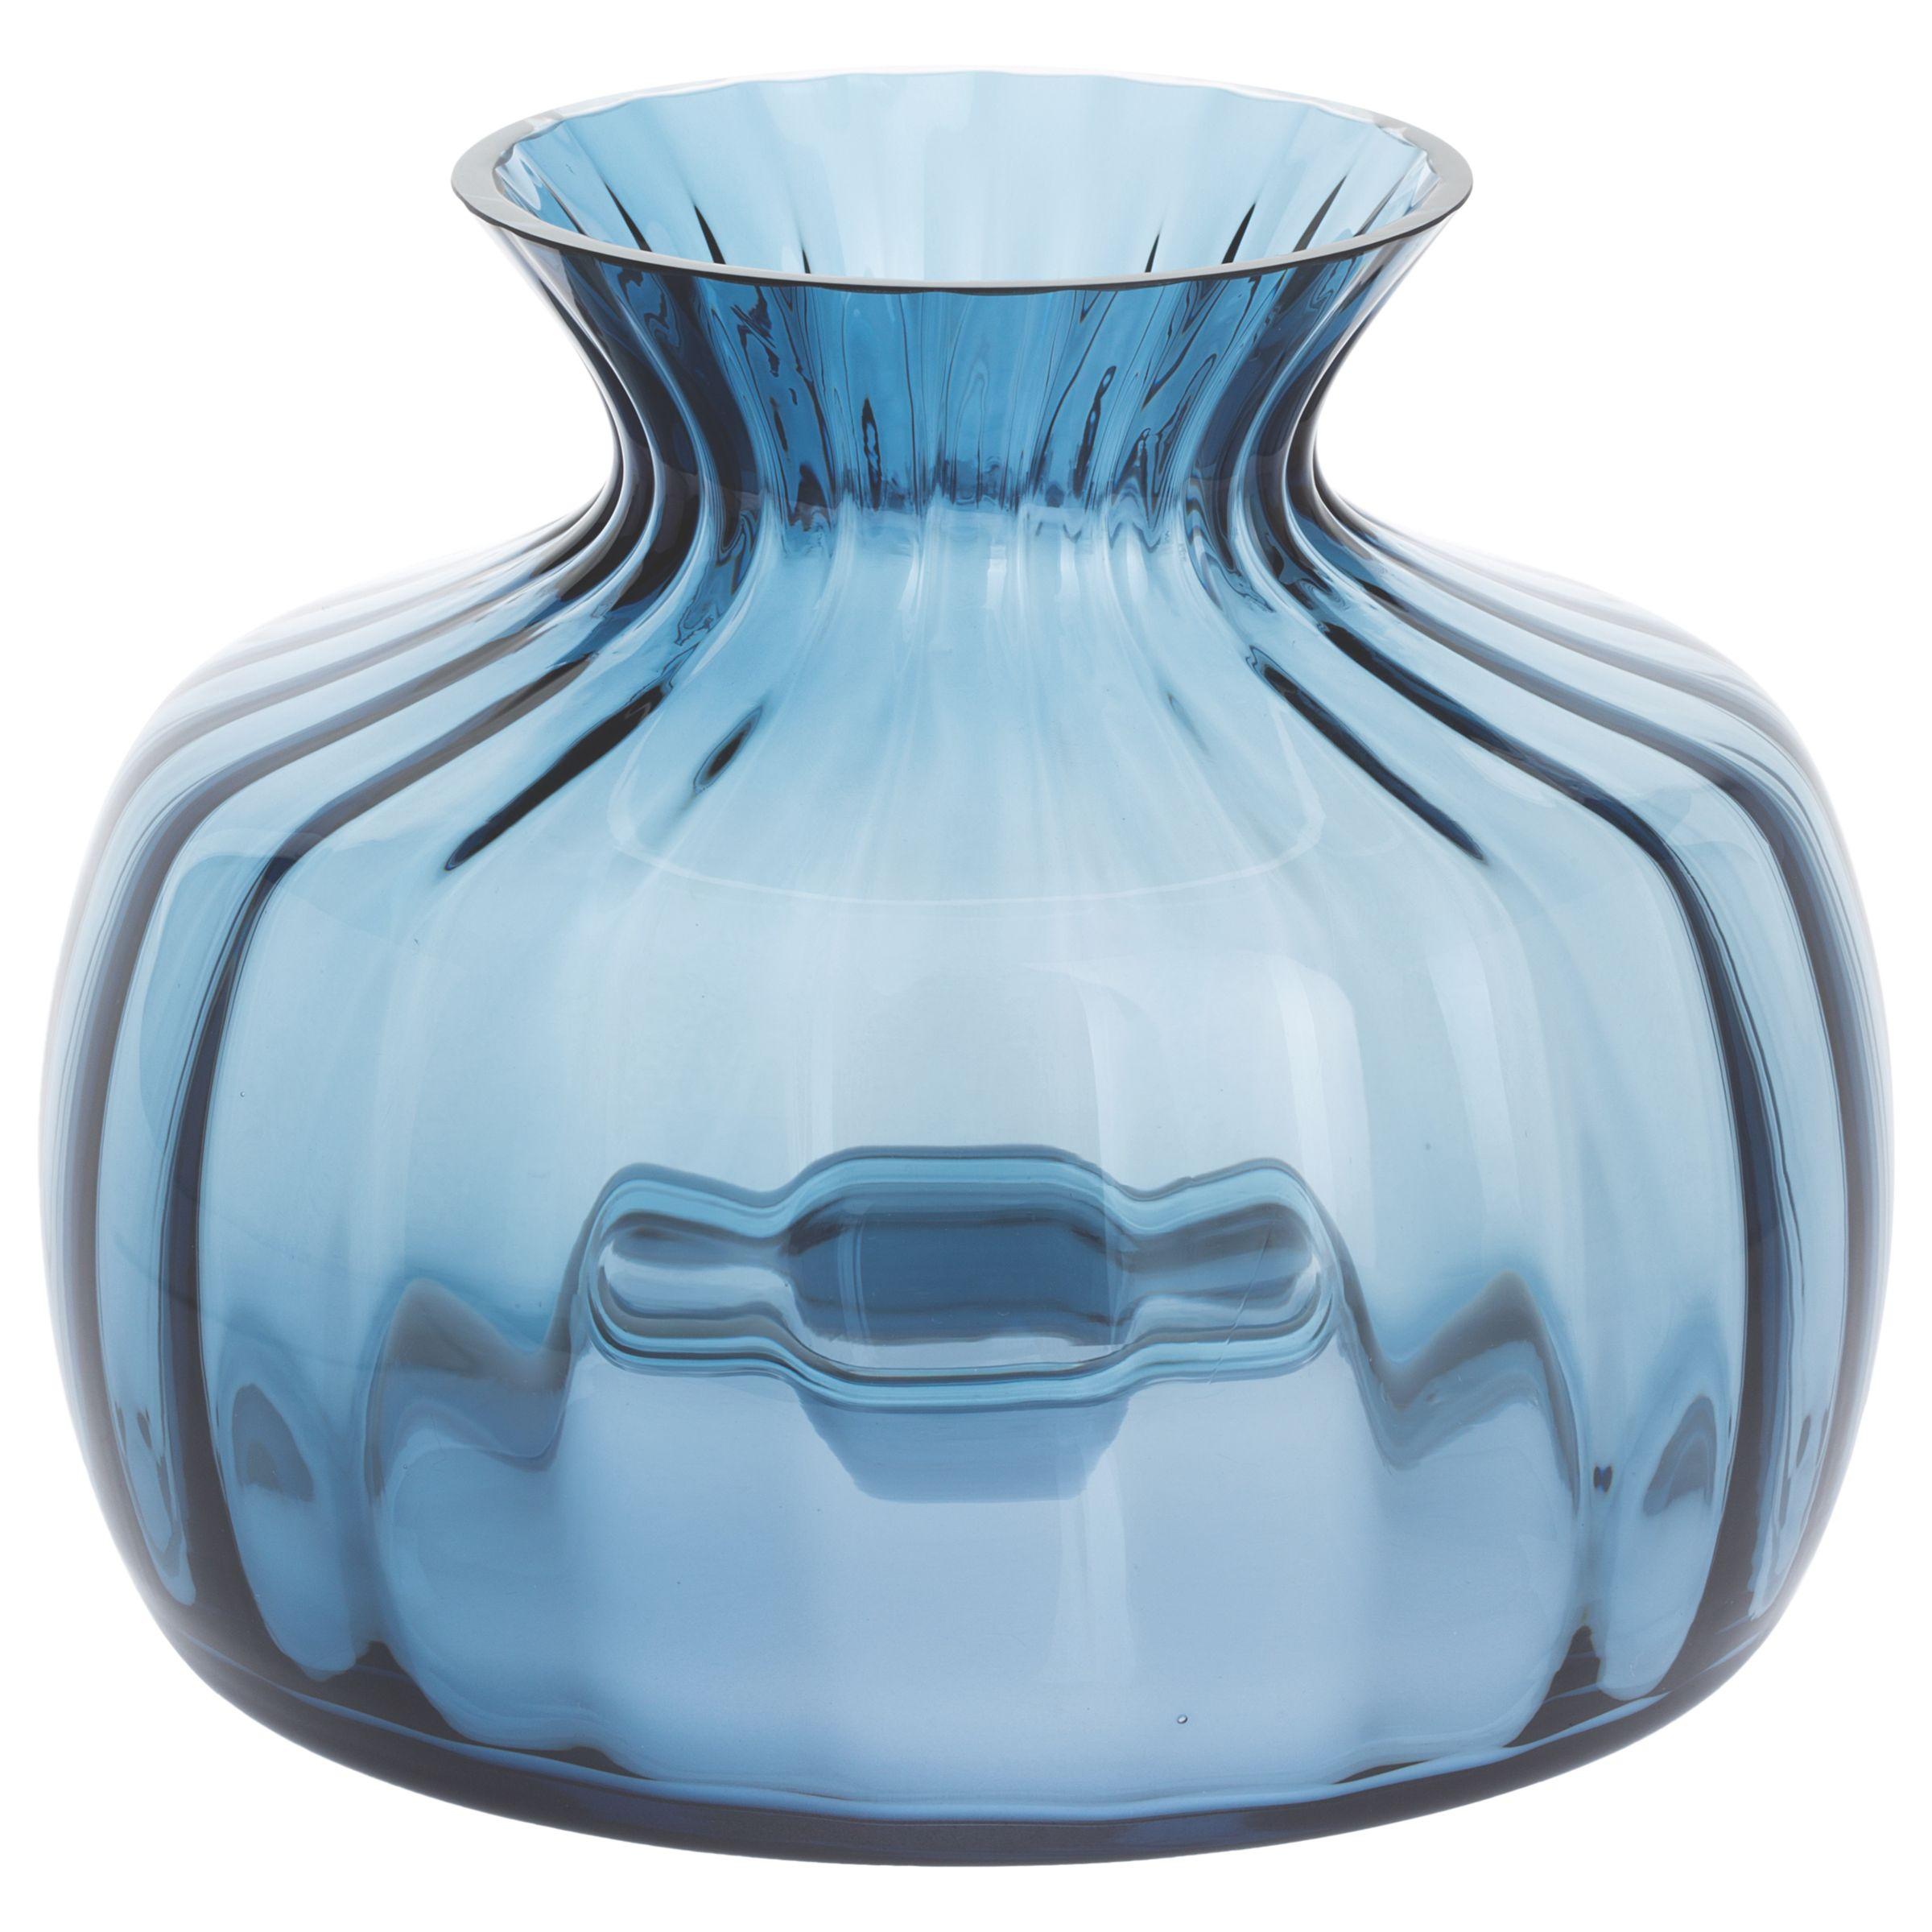 Dartington Crystal Dartington Crystal Cushion Medium Posy Vase, Ink Blue